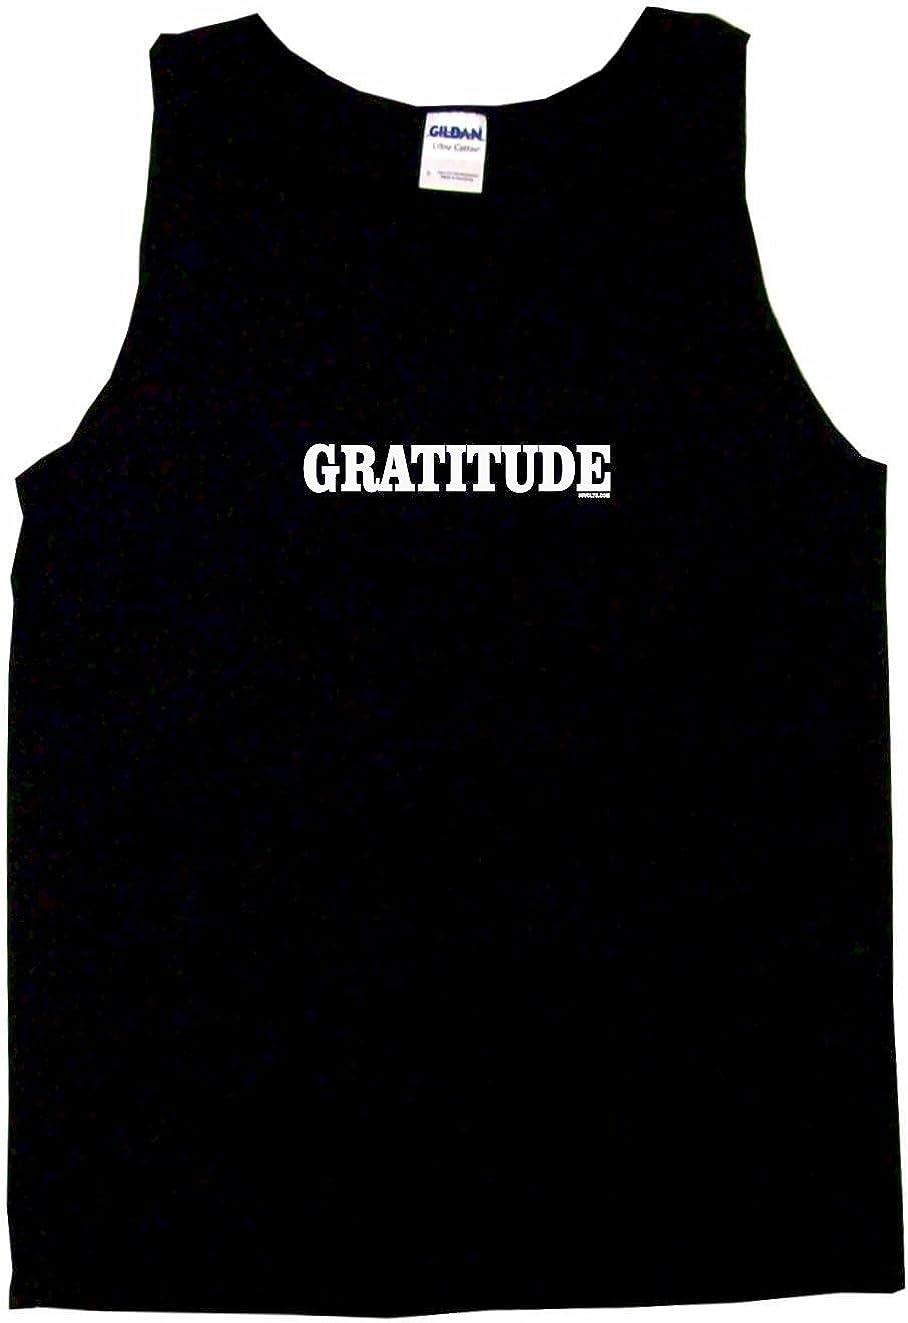 99 Volts Gratitude Men's Tee Shirt